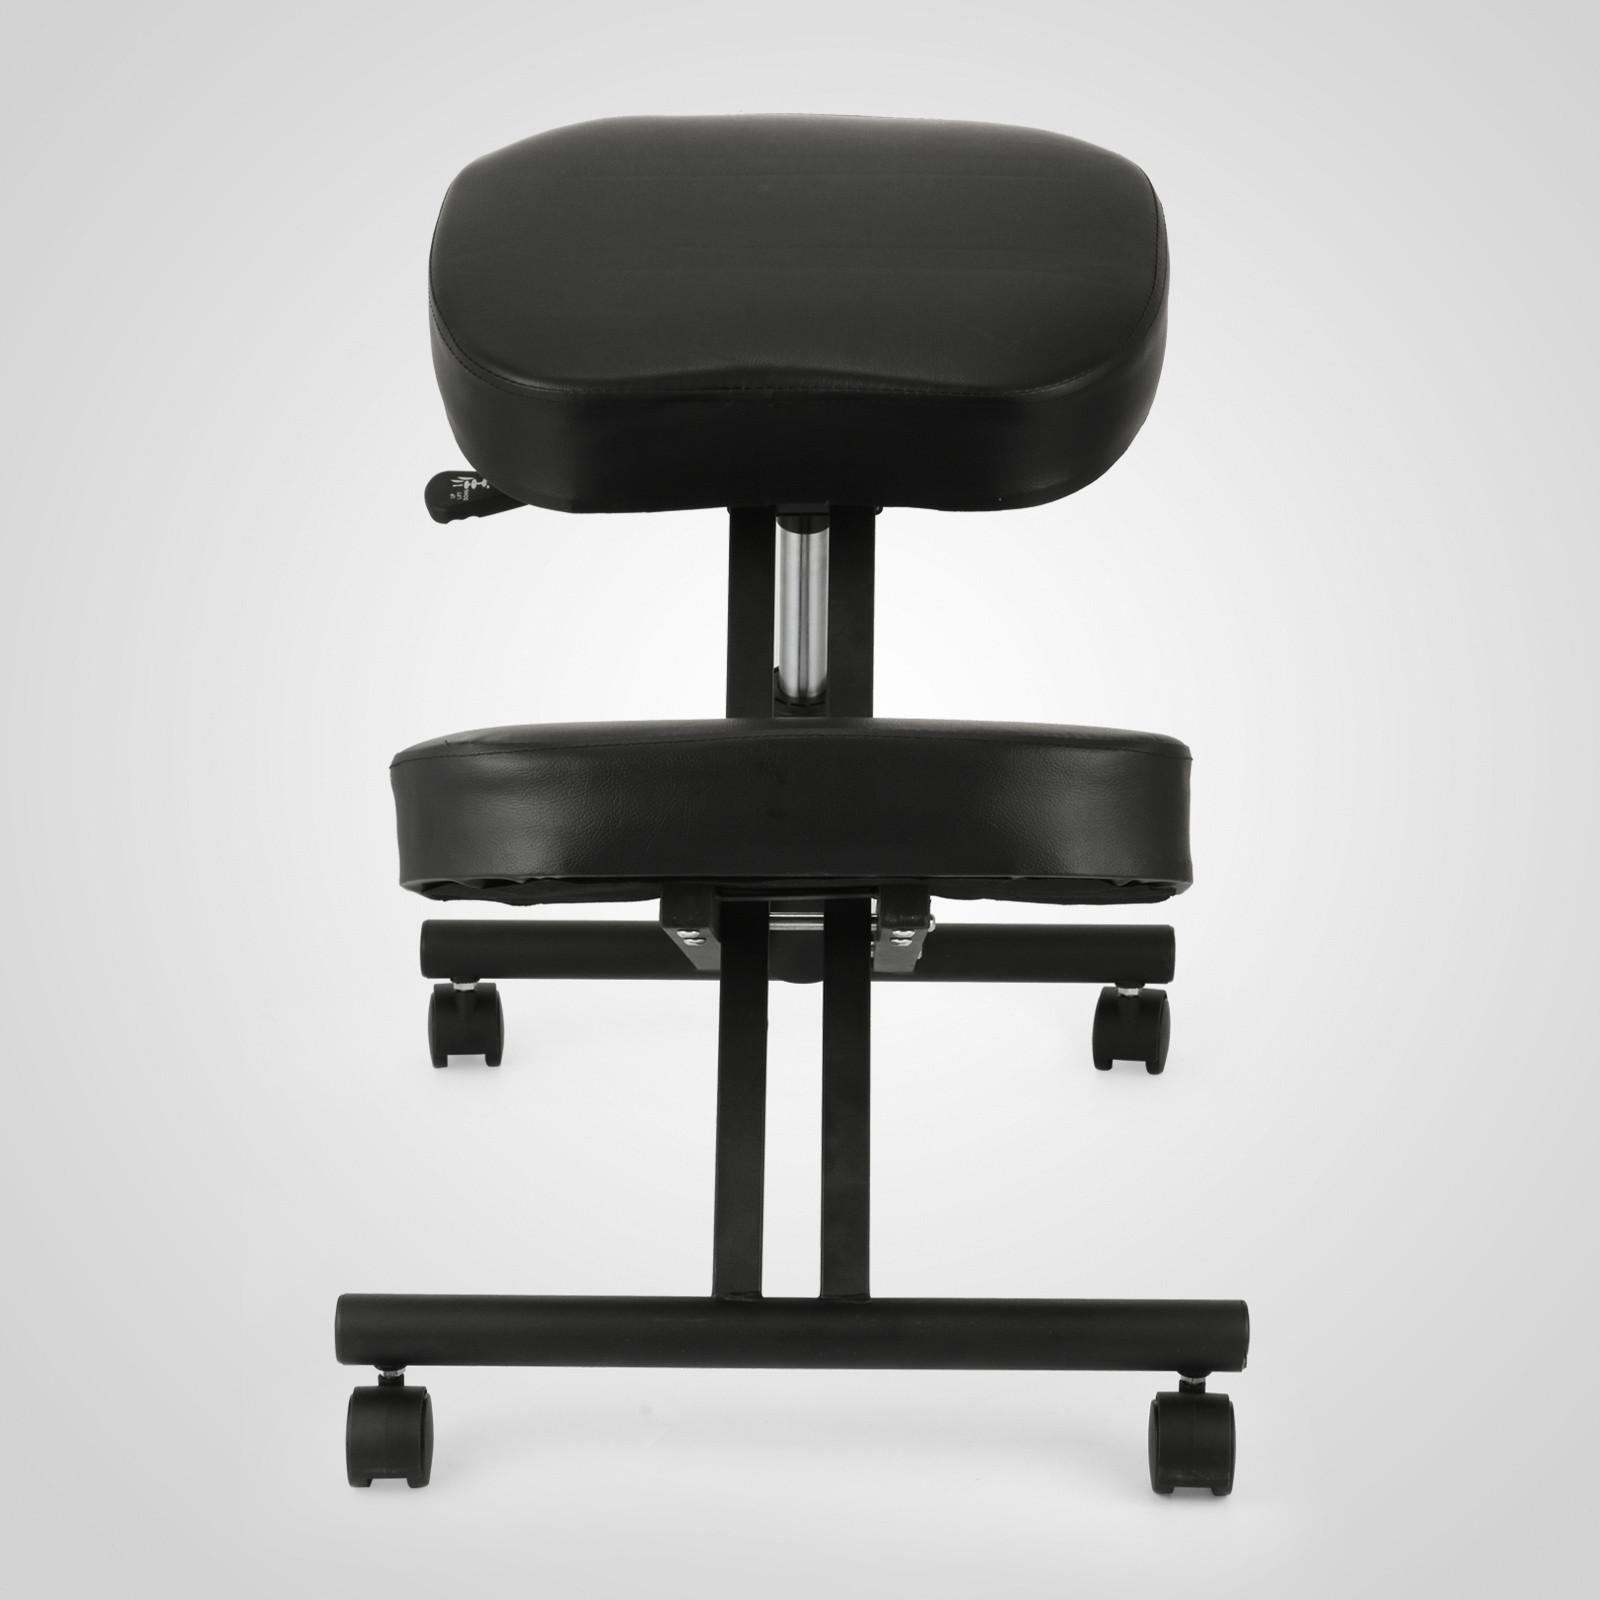 Ergonomic Kneeling Chair Bentwood Steel Frame Heavy Duty